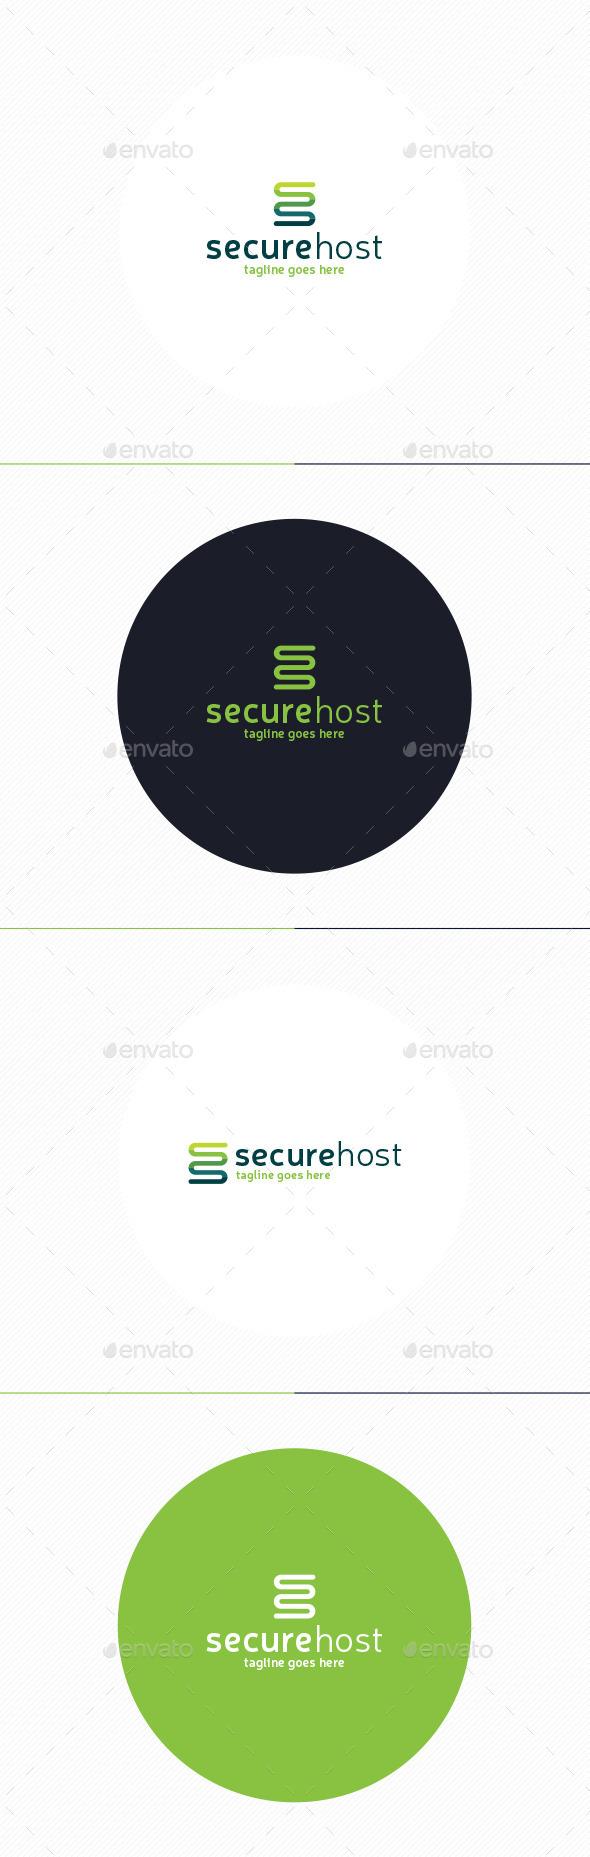 GraphicRiver Secure Host Logo 10919385